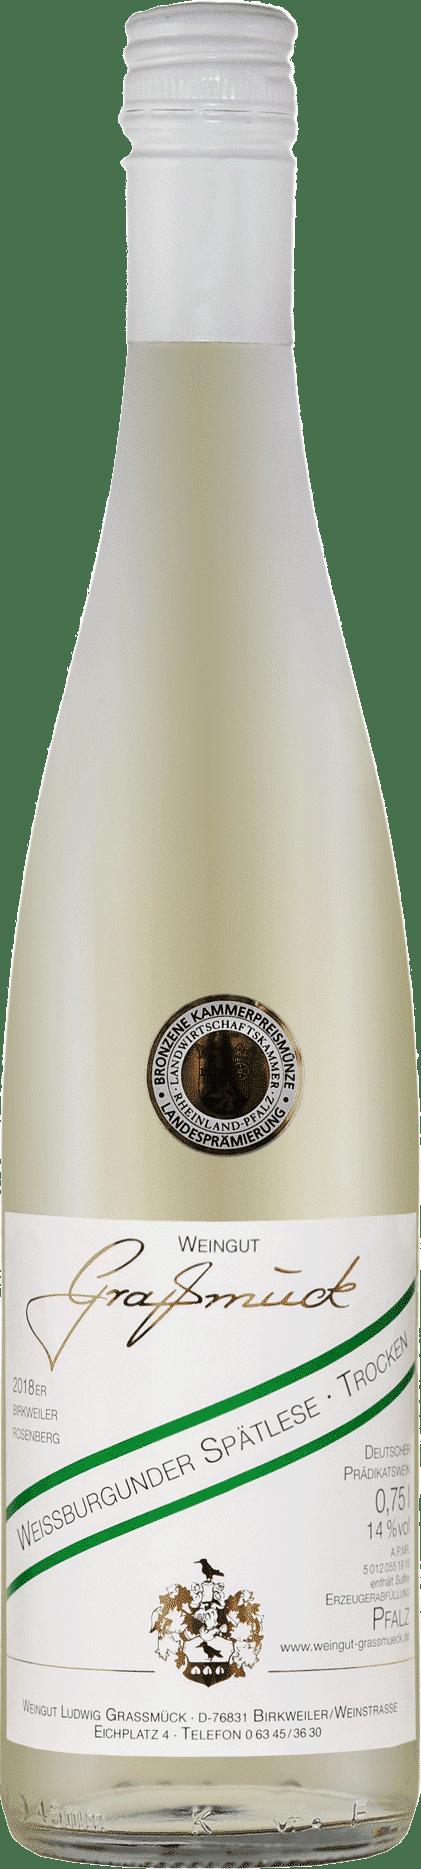 Weingut Ludwig Graßmück, Simon Graßmück, Weissburgunder Spätlese, trocken 2018